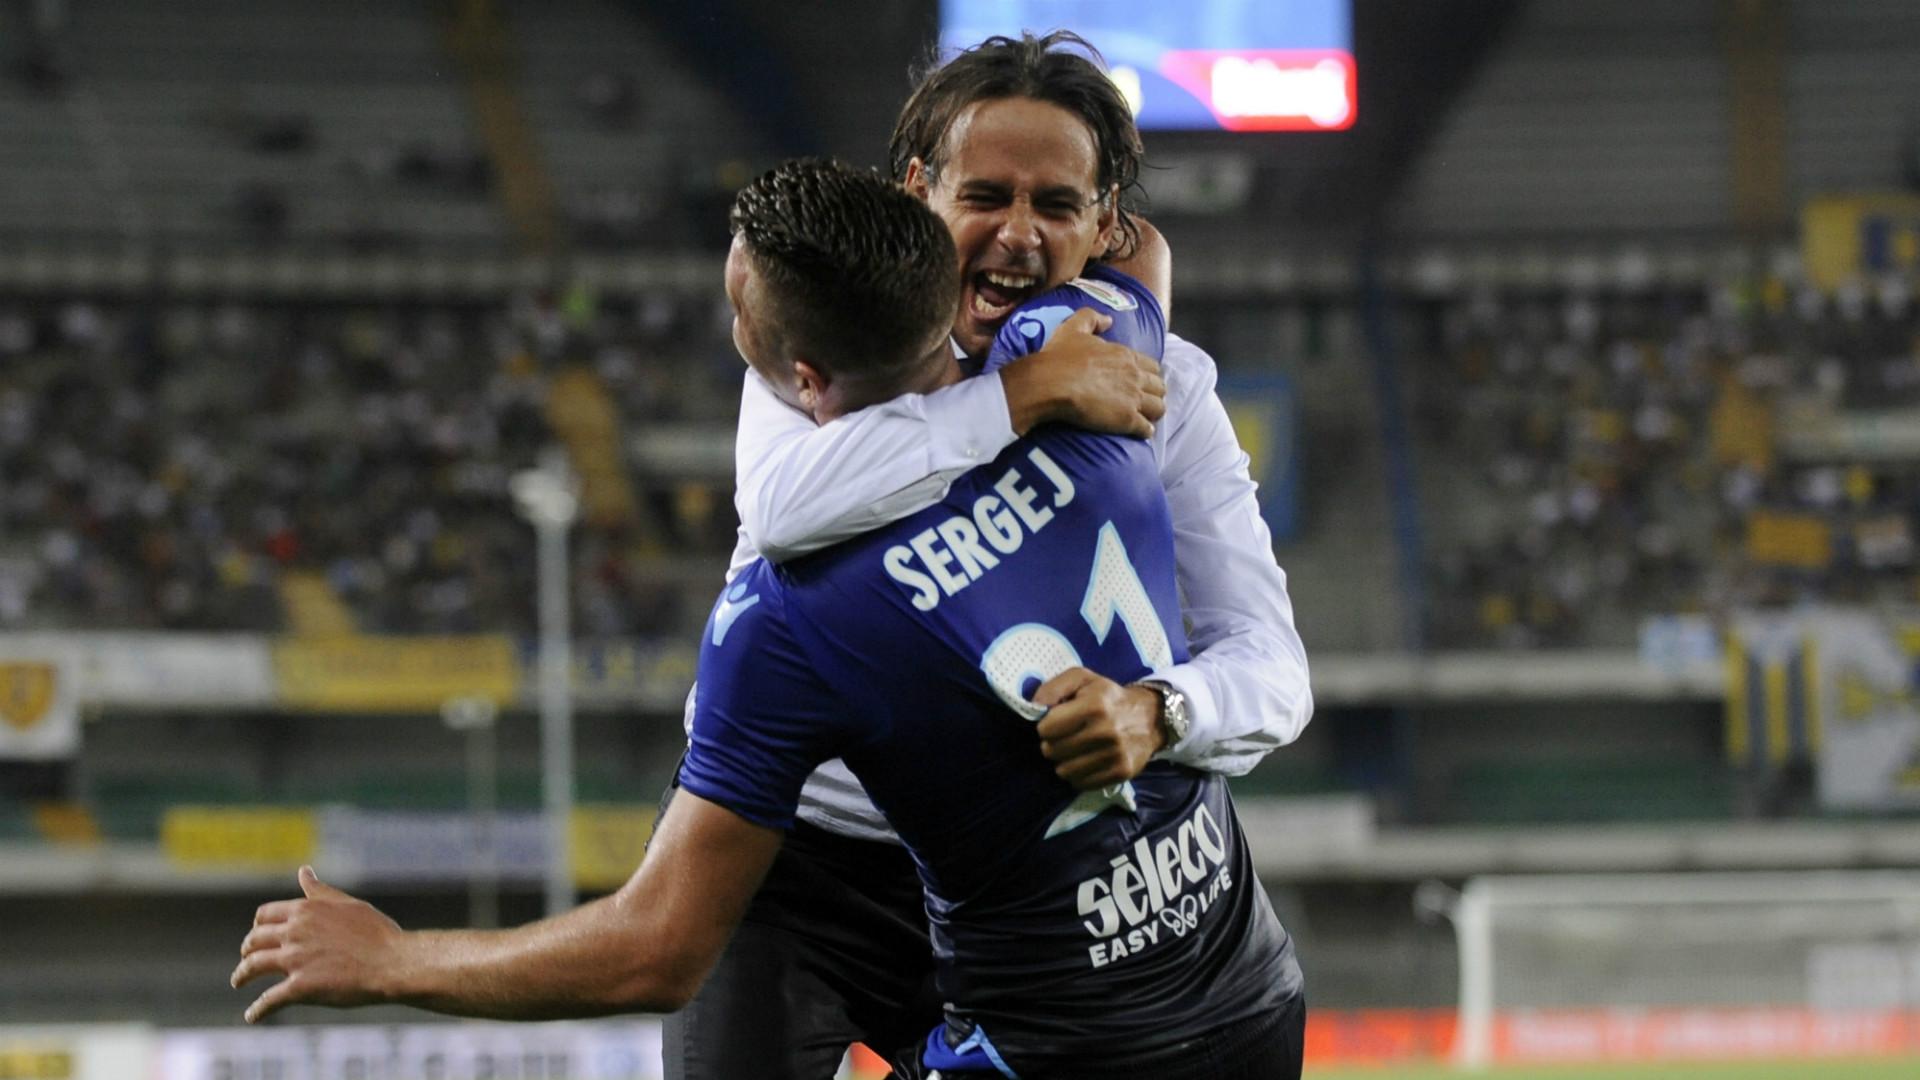 Calciomercato Juventus, l'agente di Milinkovic-Savic: